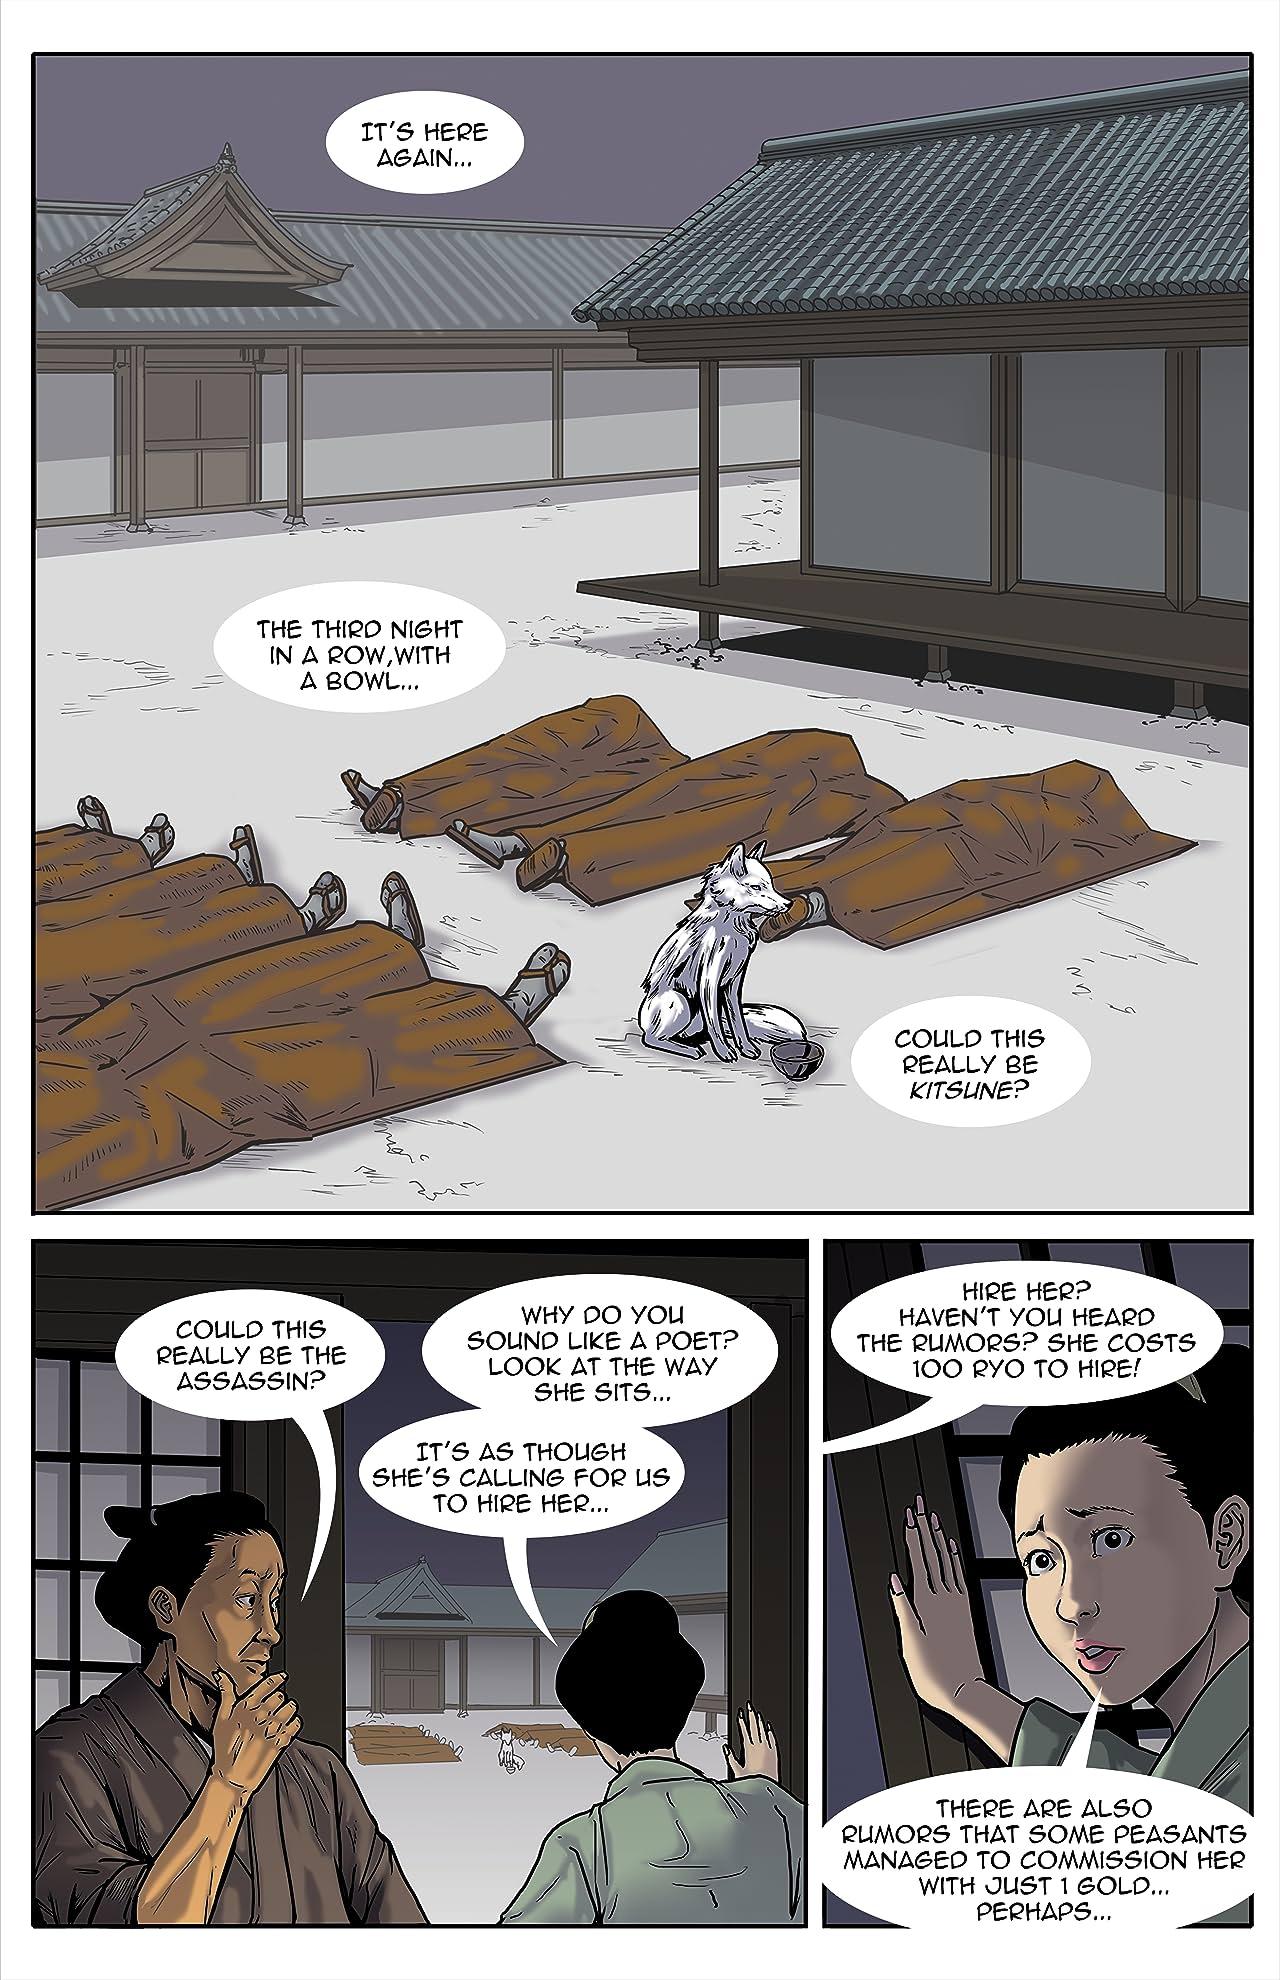 Kitsune: Assassin For Hire #13